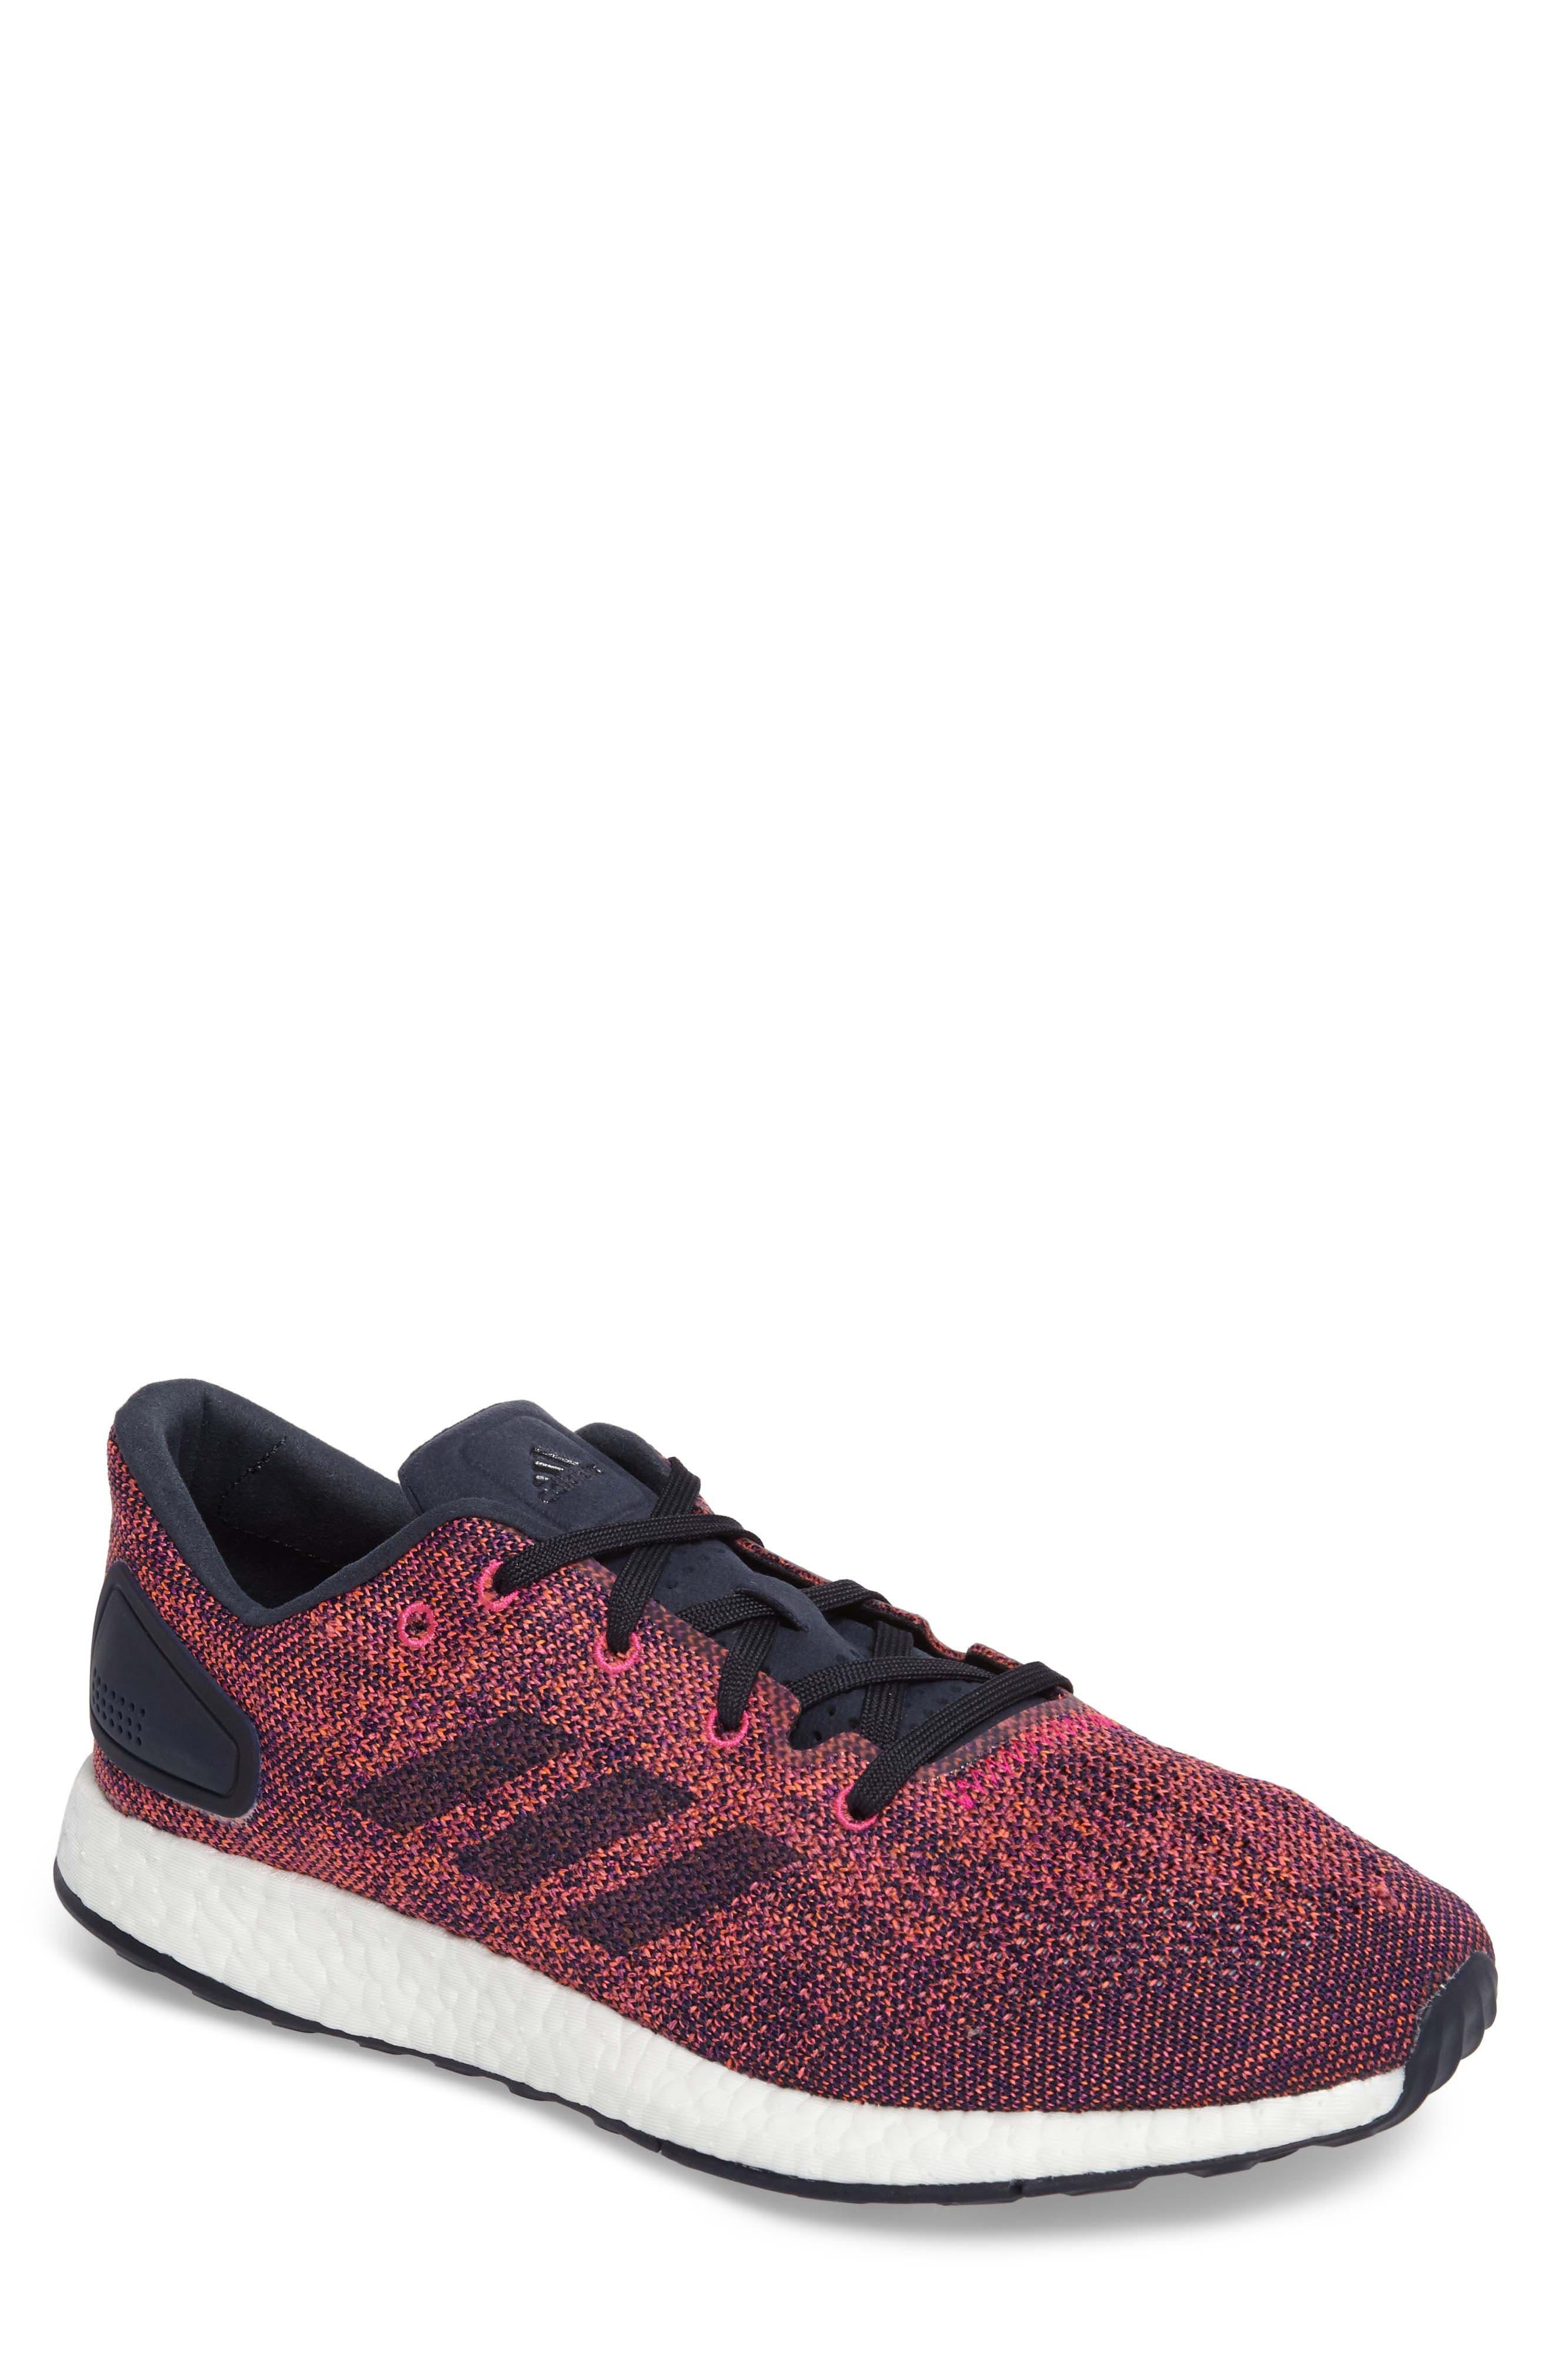 PureBoost DPR LTD Running Shoe,                         Main,                         color,